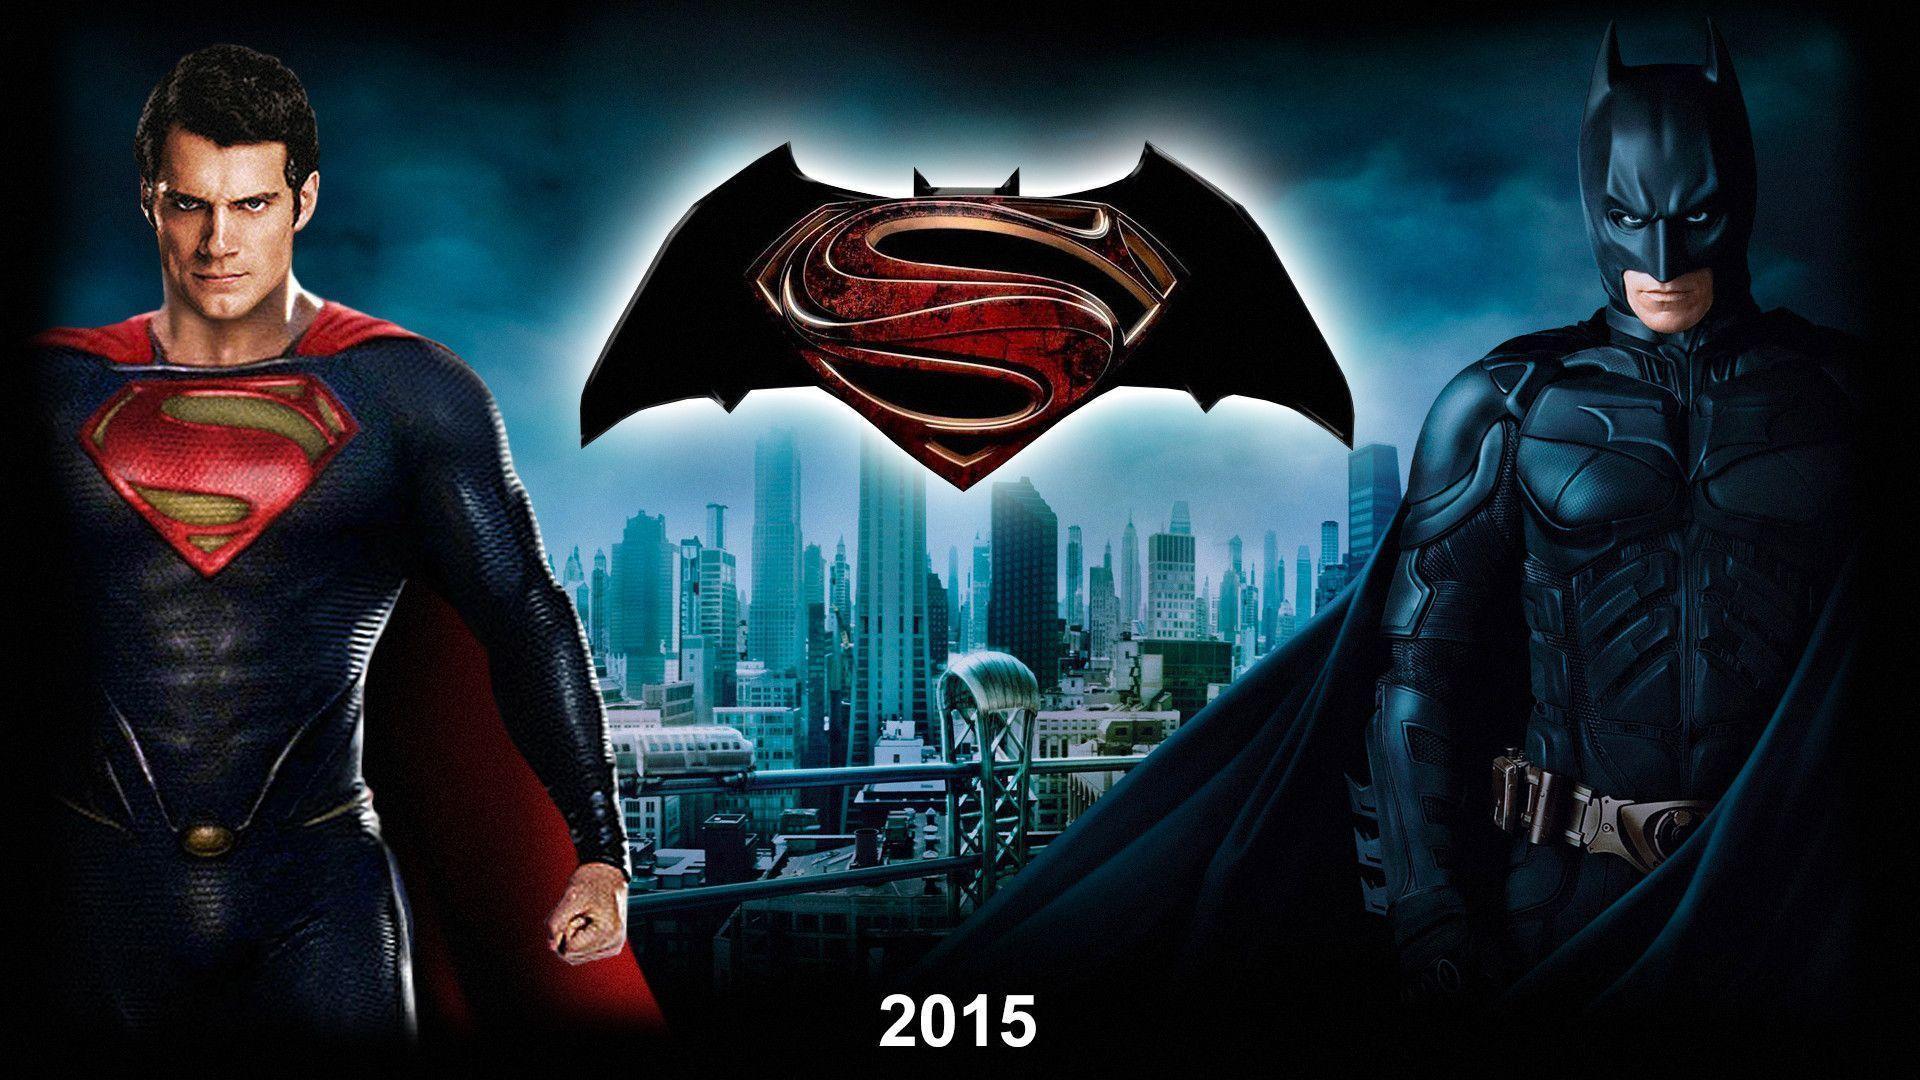 wallpapers for batman superman wallpaper